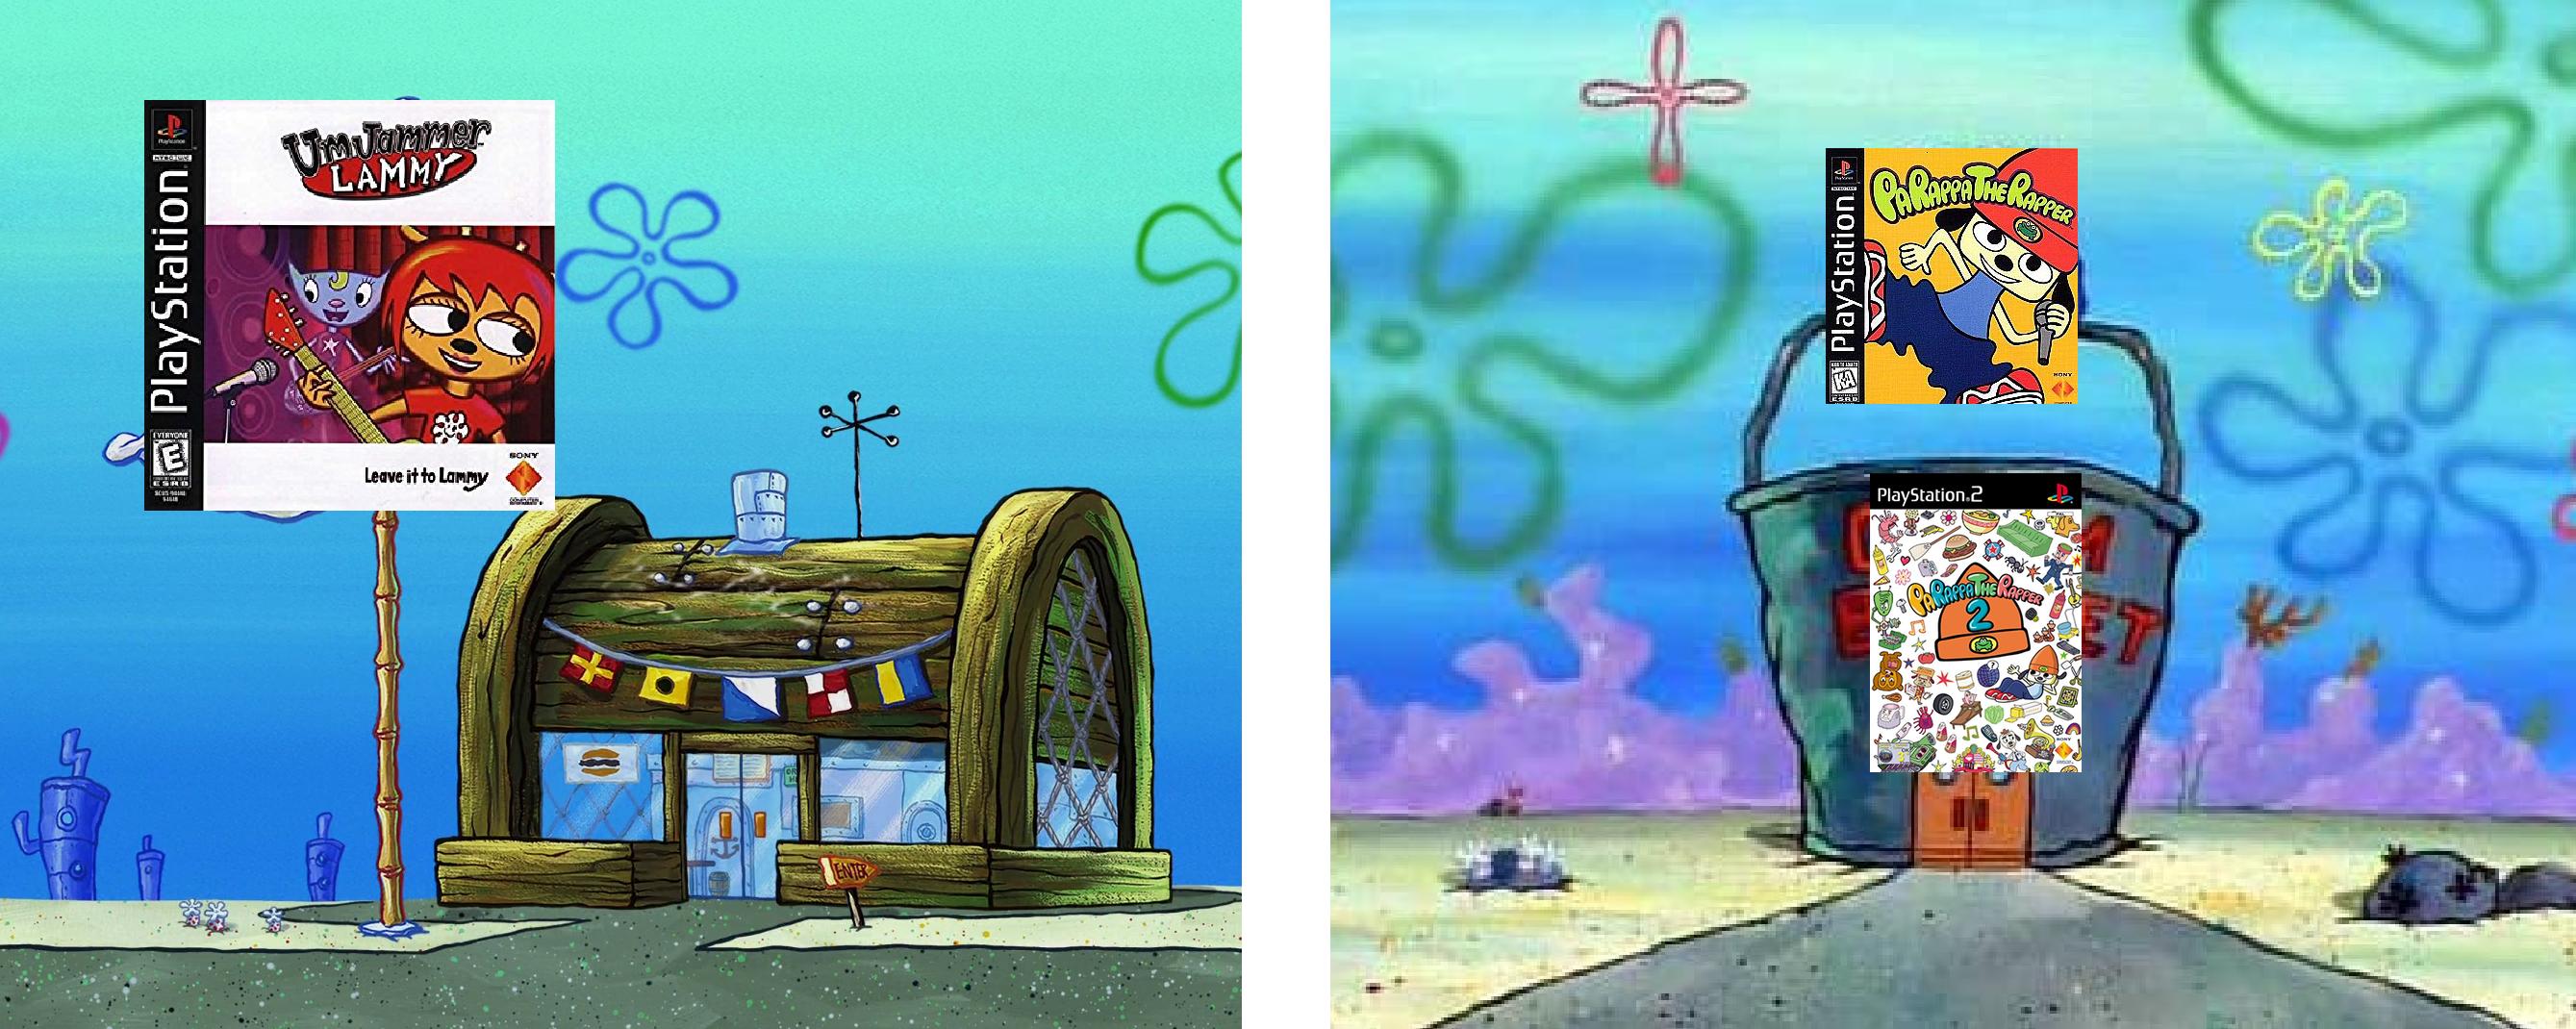 Krusty krab vs chum bucket tru facct